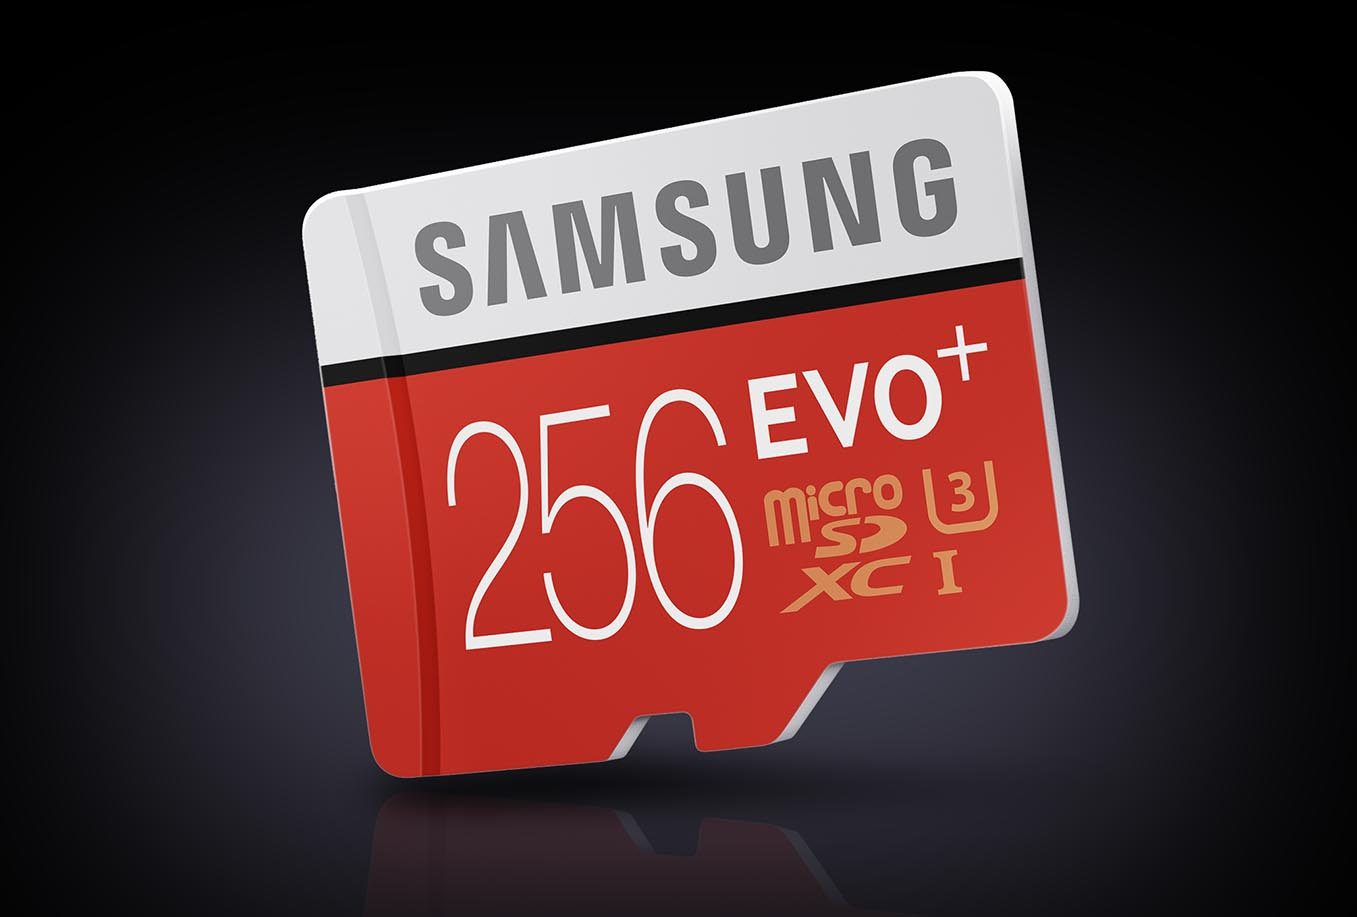 Micro SD Samsung 256 EVO+